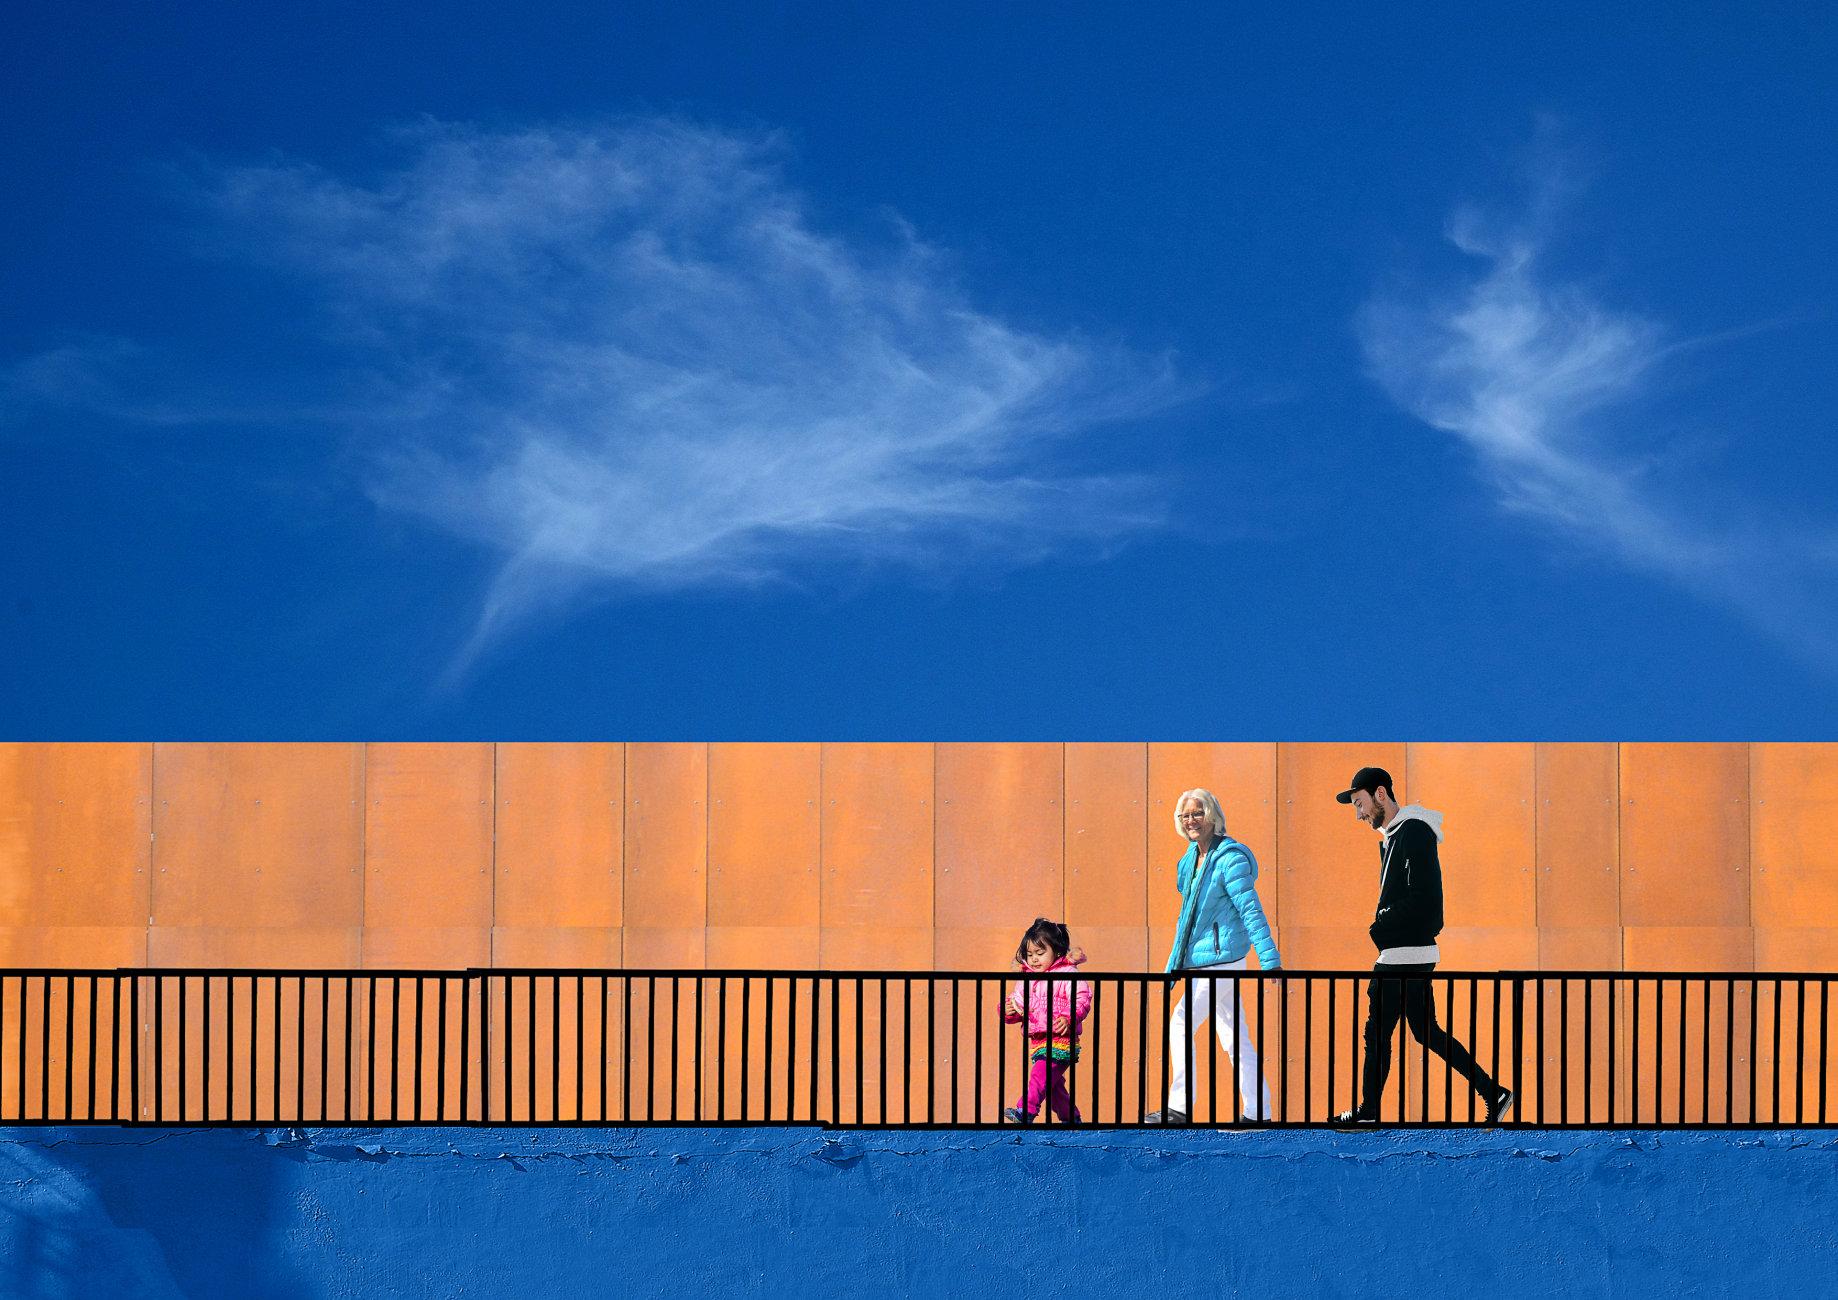 Orange and blue walk